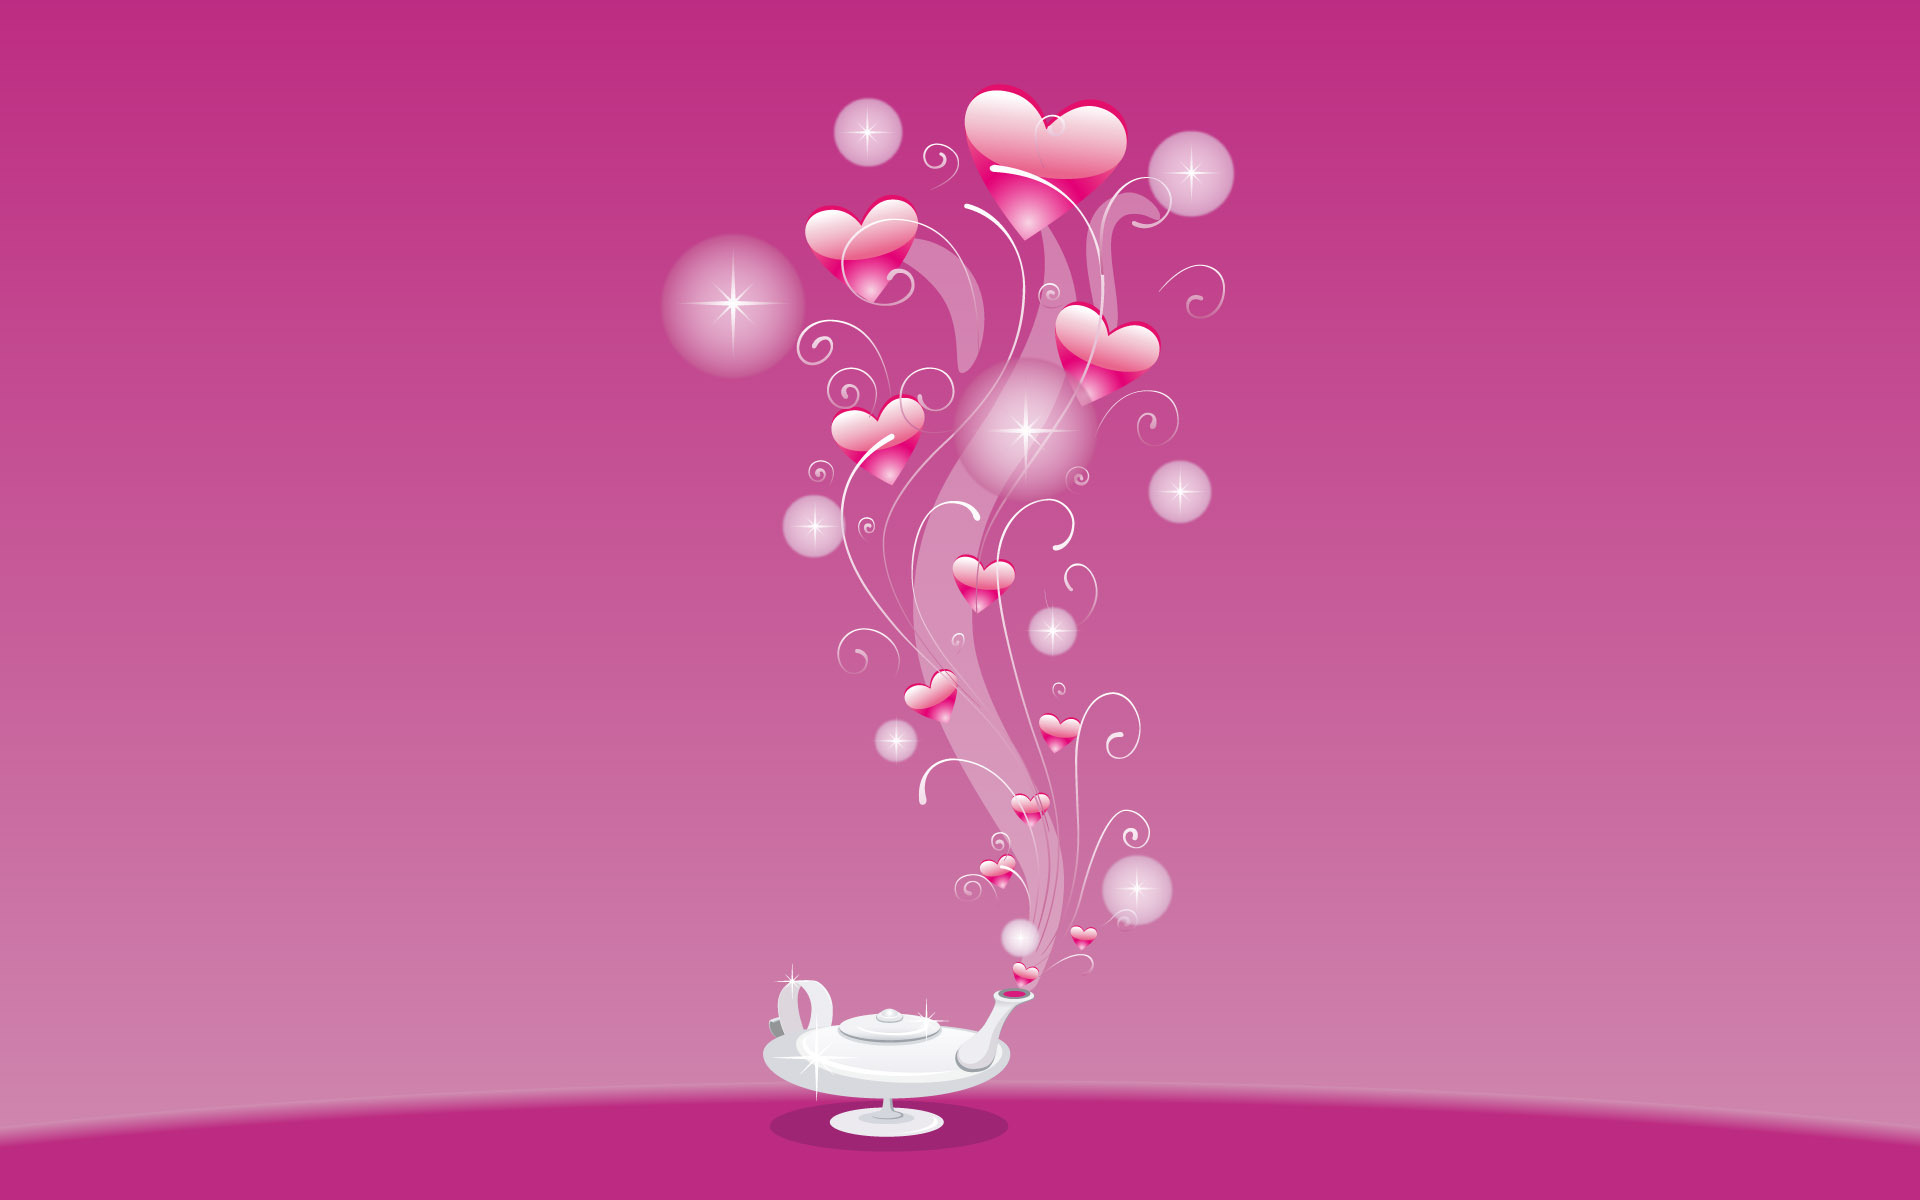 L Amour Fond D Ecran L Amour Fond D Ecran 4187497 Fanpop